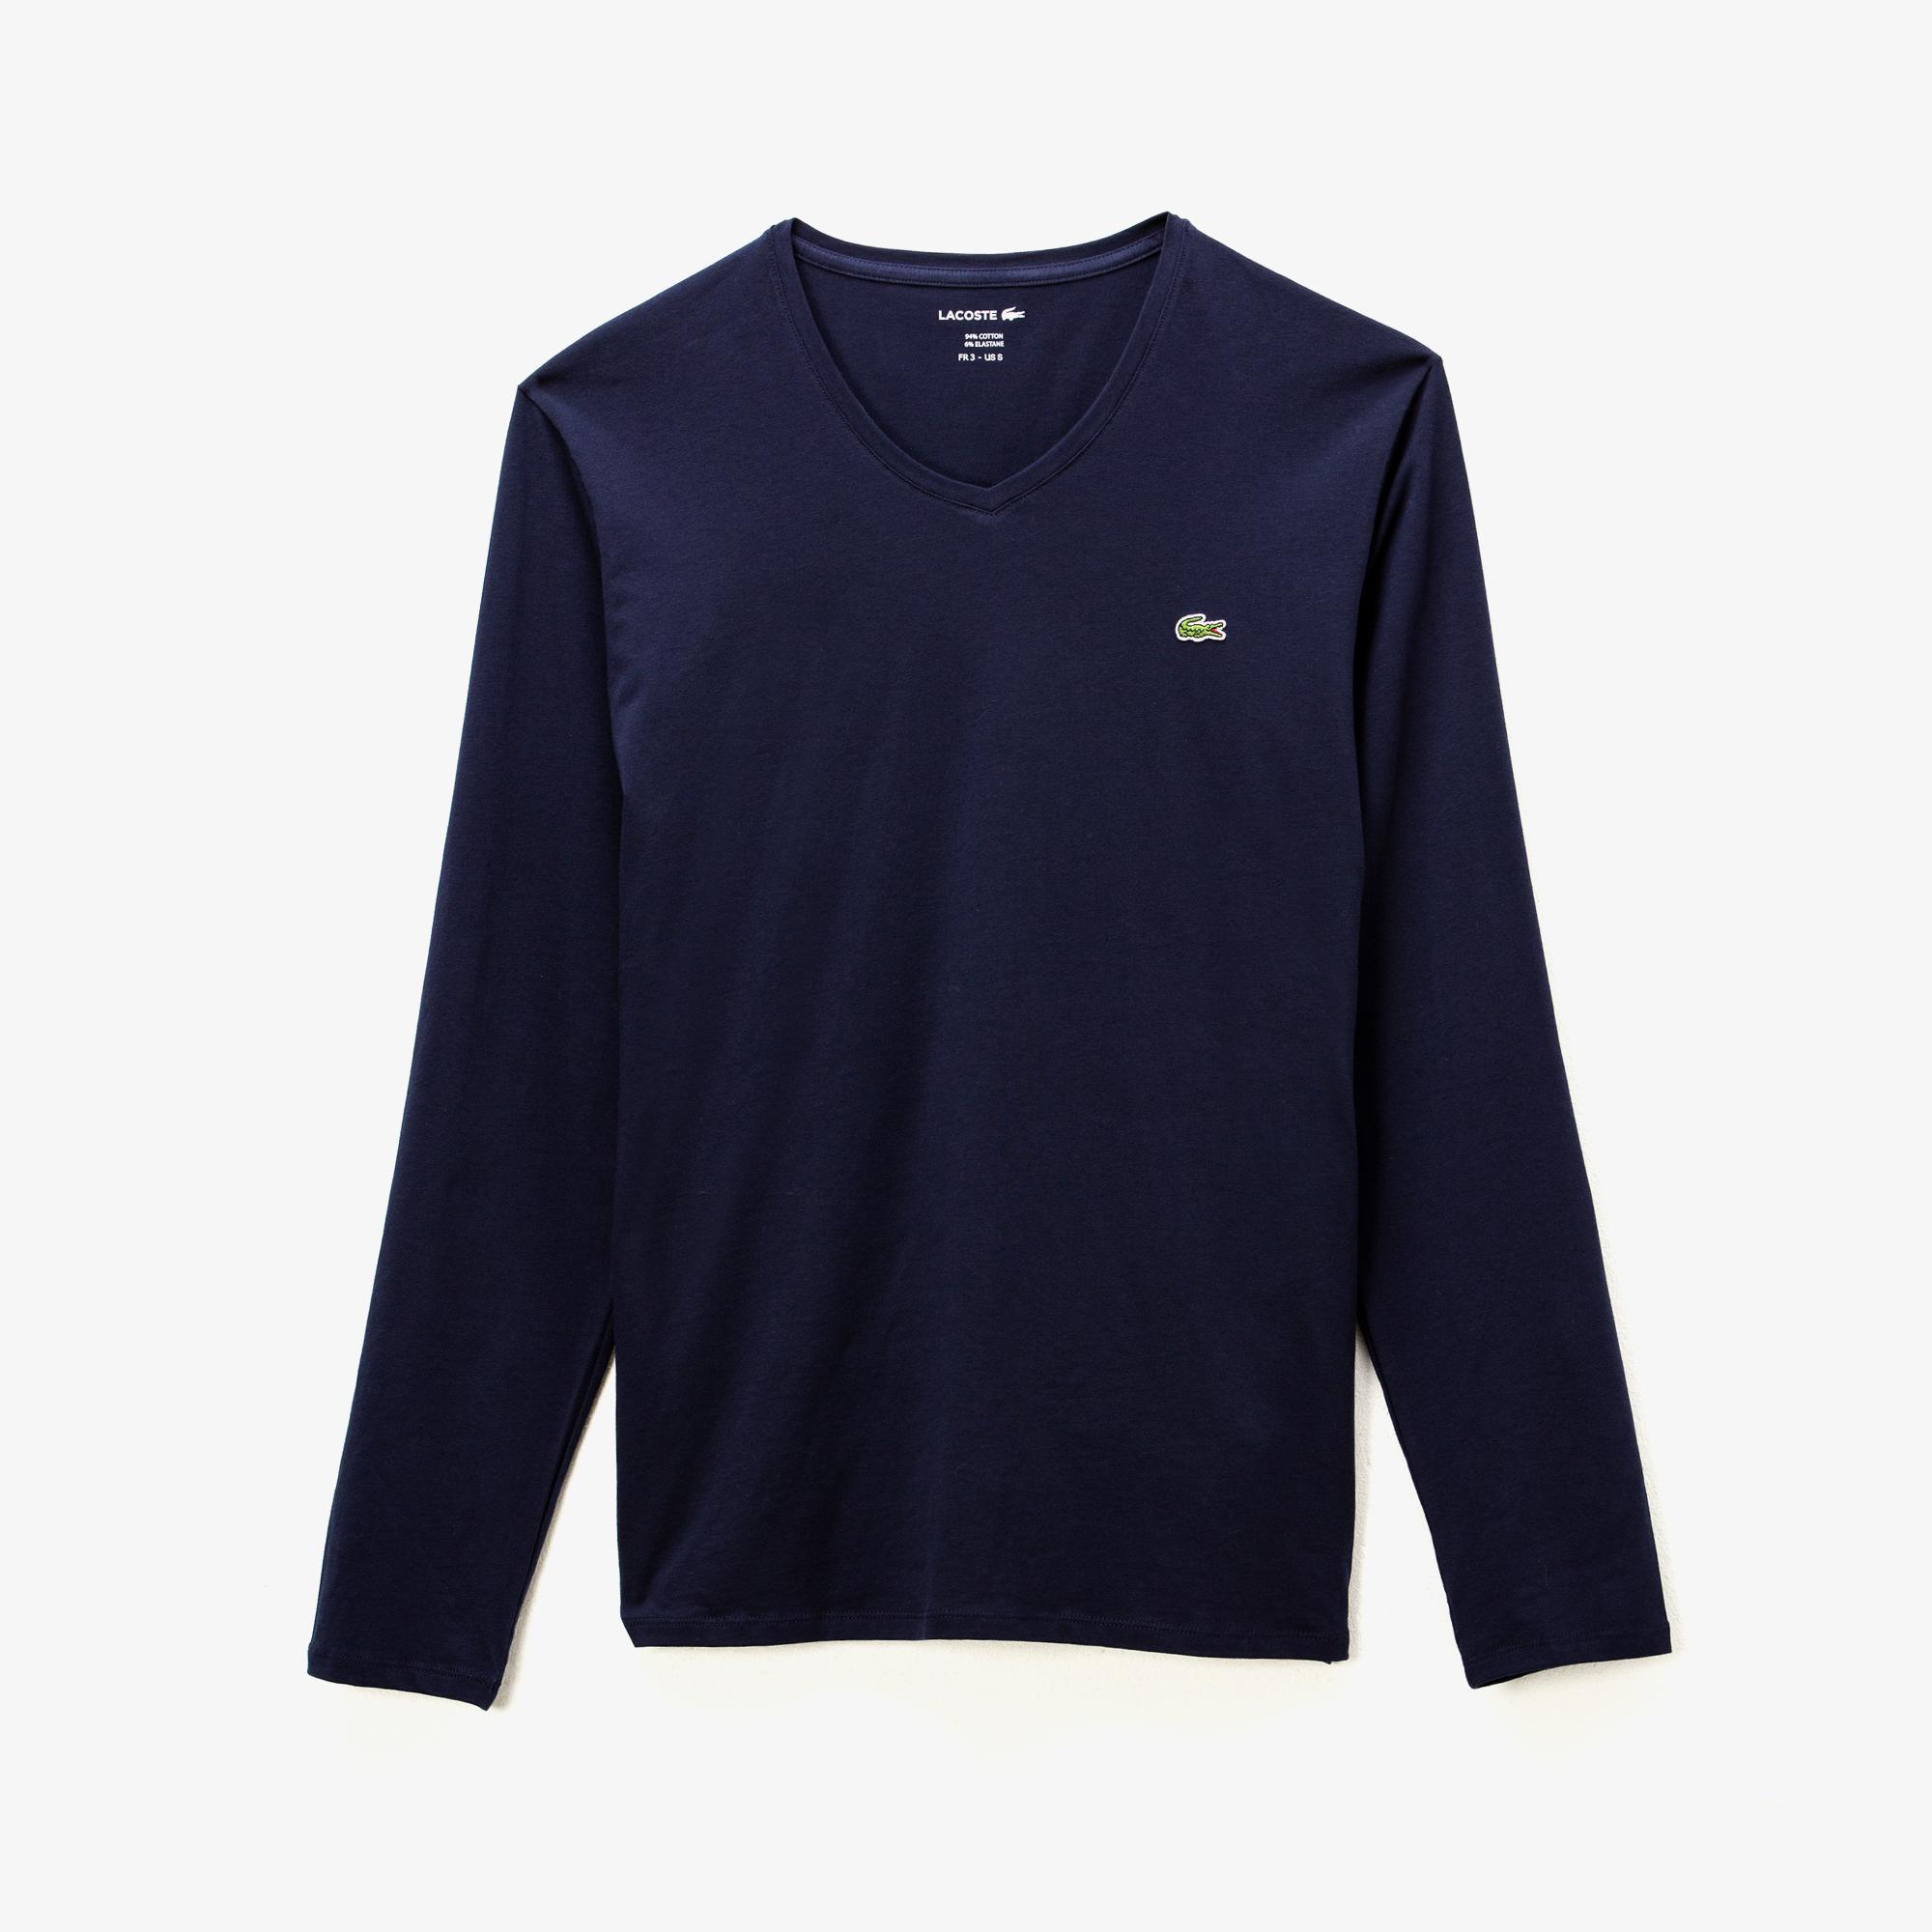 Lacoste Erkek V Yaka Uzun Kollu Lacivert T-Shirt